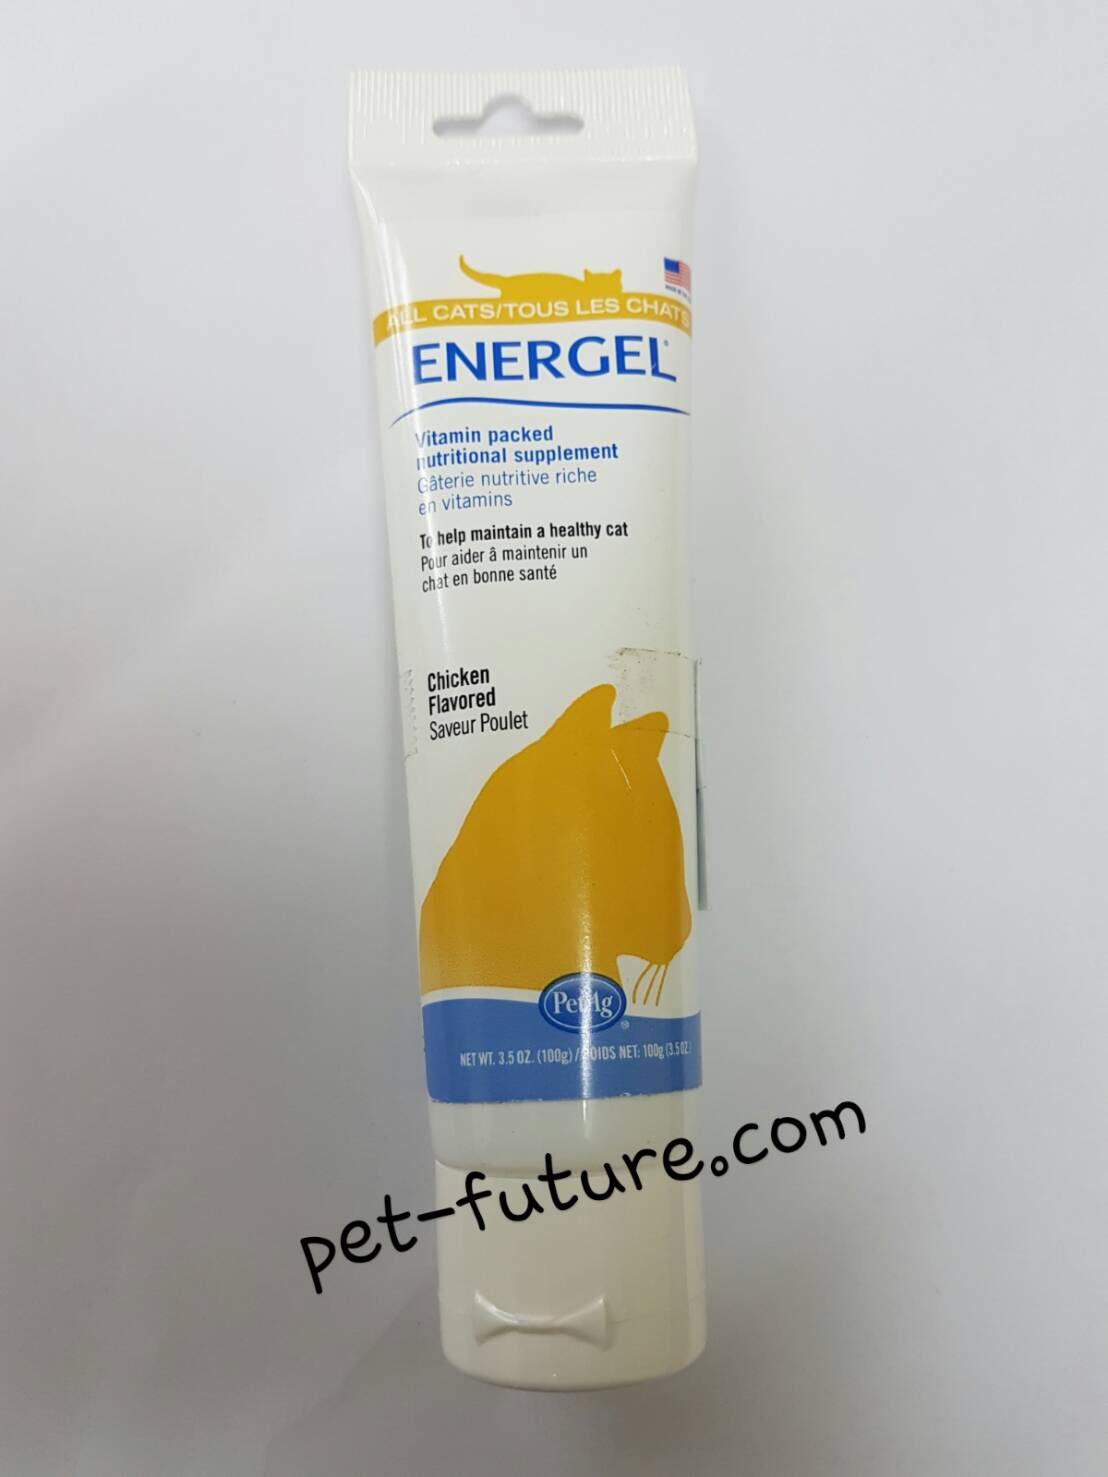 ENERGEL all Cat เจลเพิ่มพลังงาน สัตว์ป่วยพักฟื้น Exp.10/18